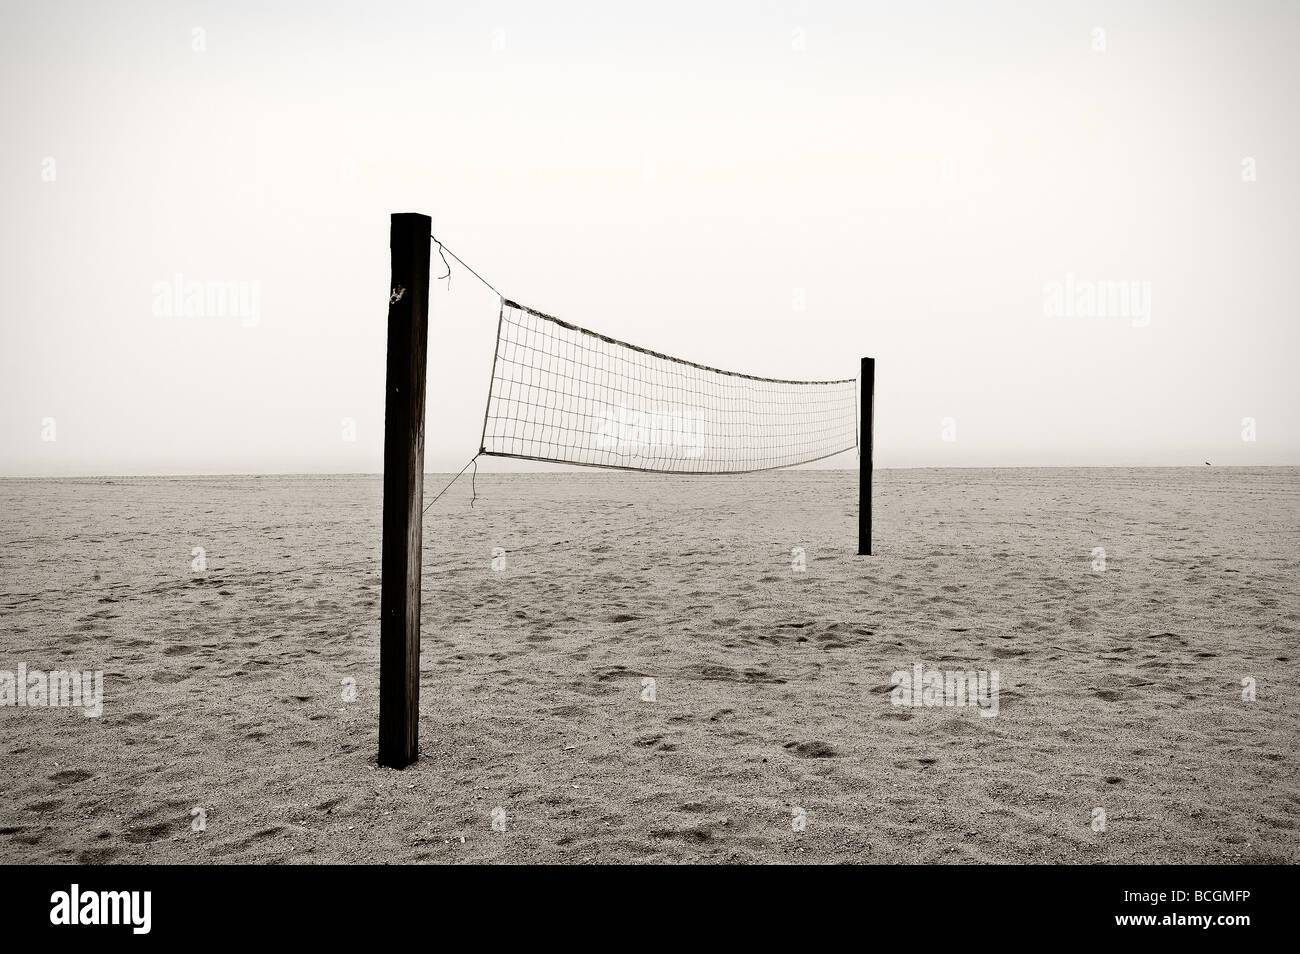 Beach-Volleyball-Netz Stockbild